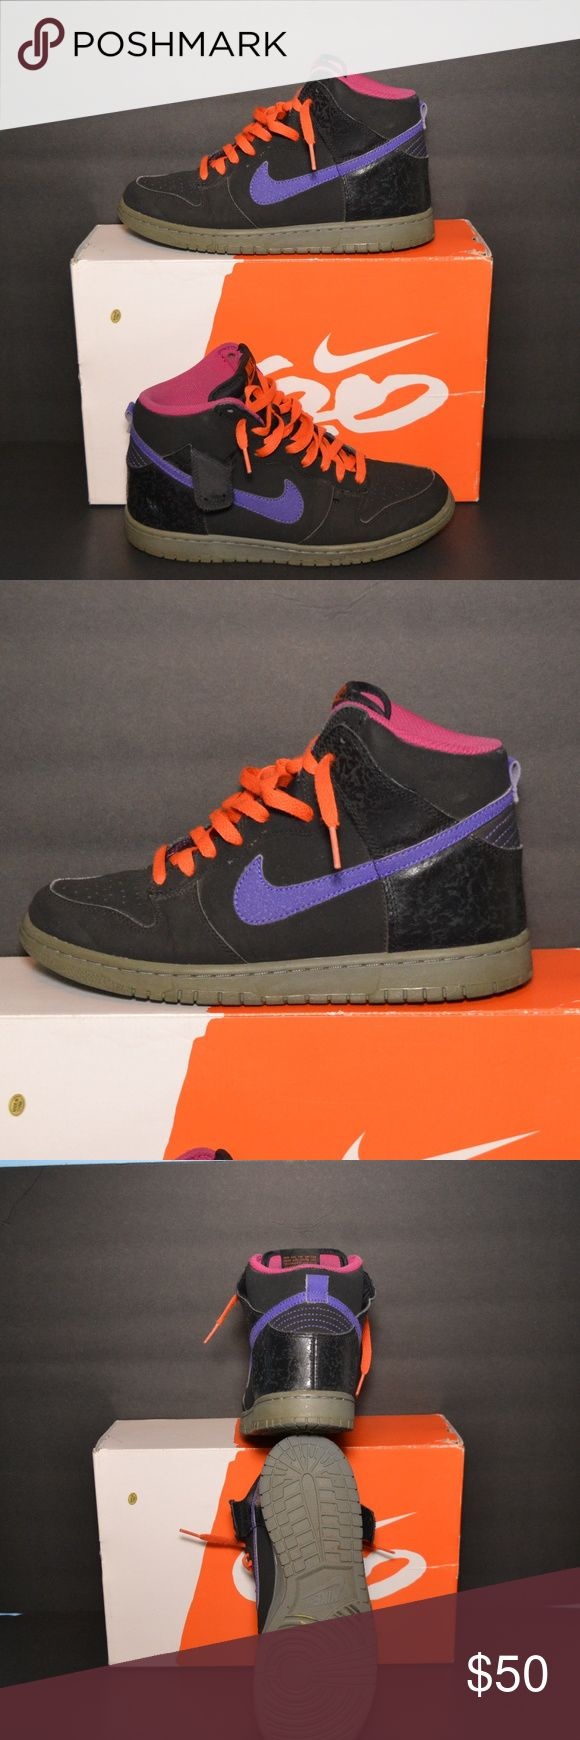 Shoes (Nike Dunks) Co diction: Used Color(s): Black, Orange, & Purple Size(s): US (Men) 8.5 UK 7.5 Euro 42 CM 26.5 Description: Orange, black & purple high-top Nike Dunks   Nike Nike Shoes Sneakers